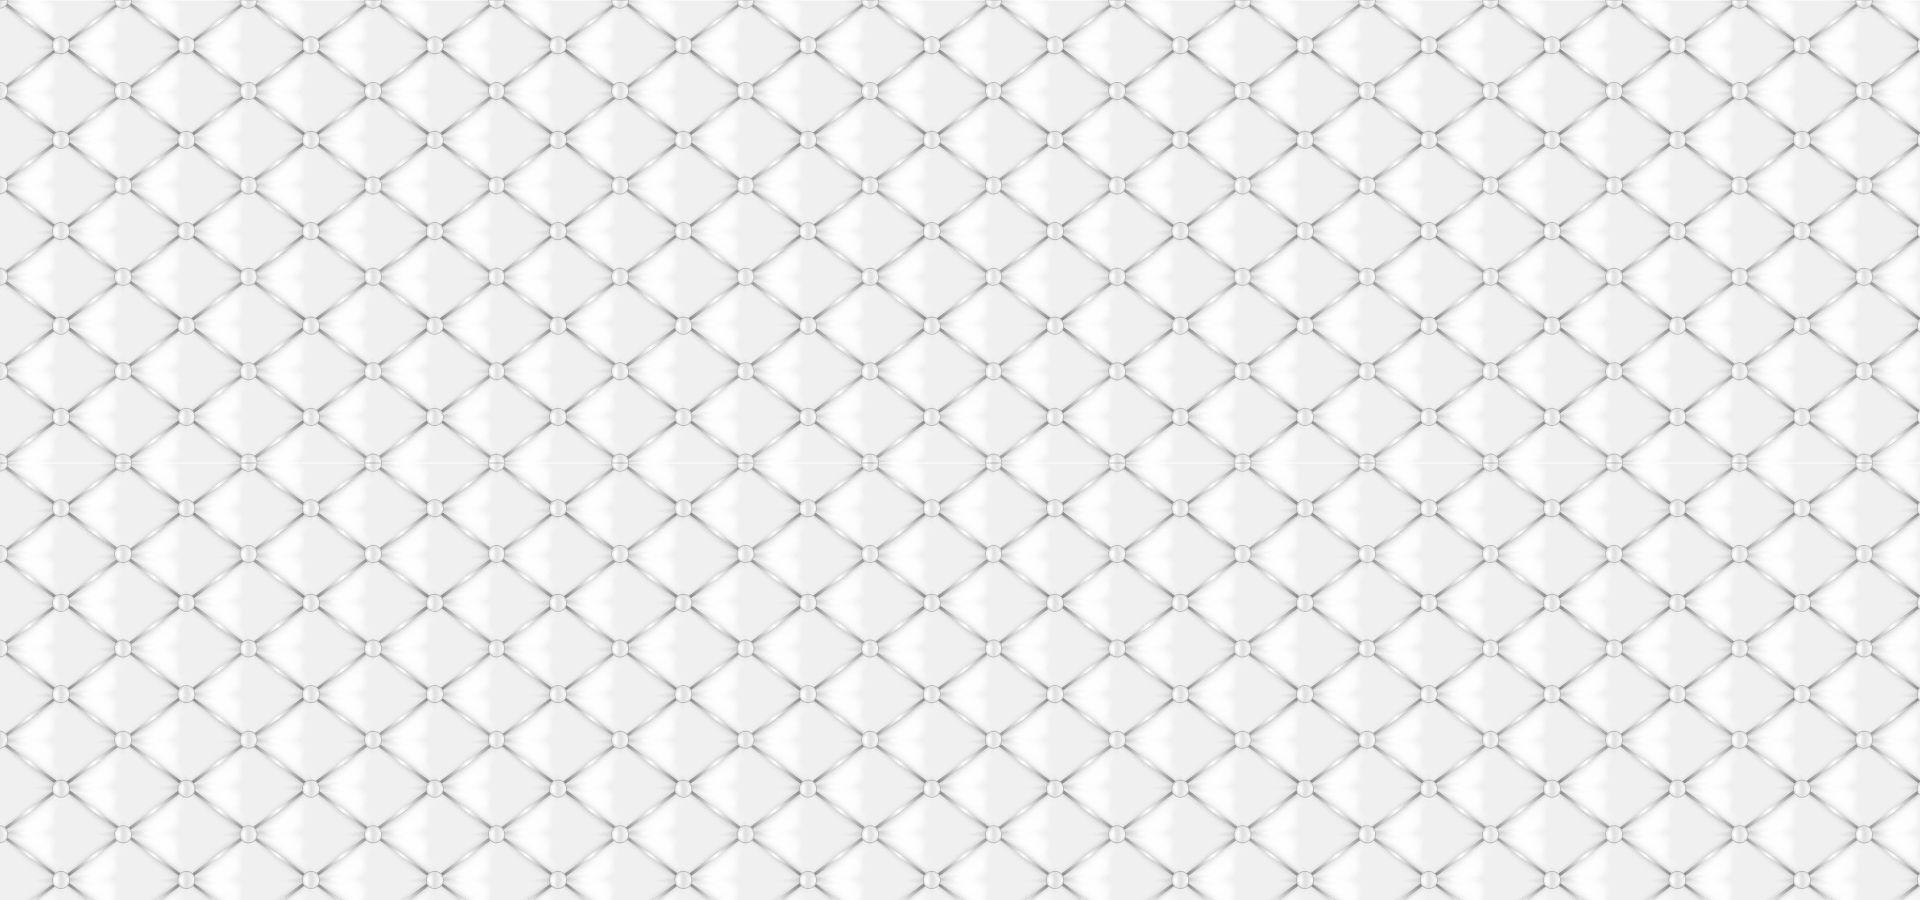 White Diamond Checkerboard Background Oboi Iskusstvo Tekstury